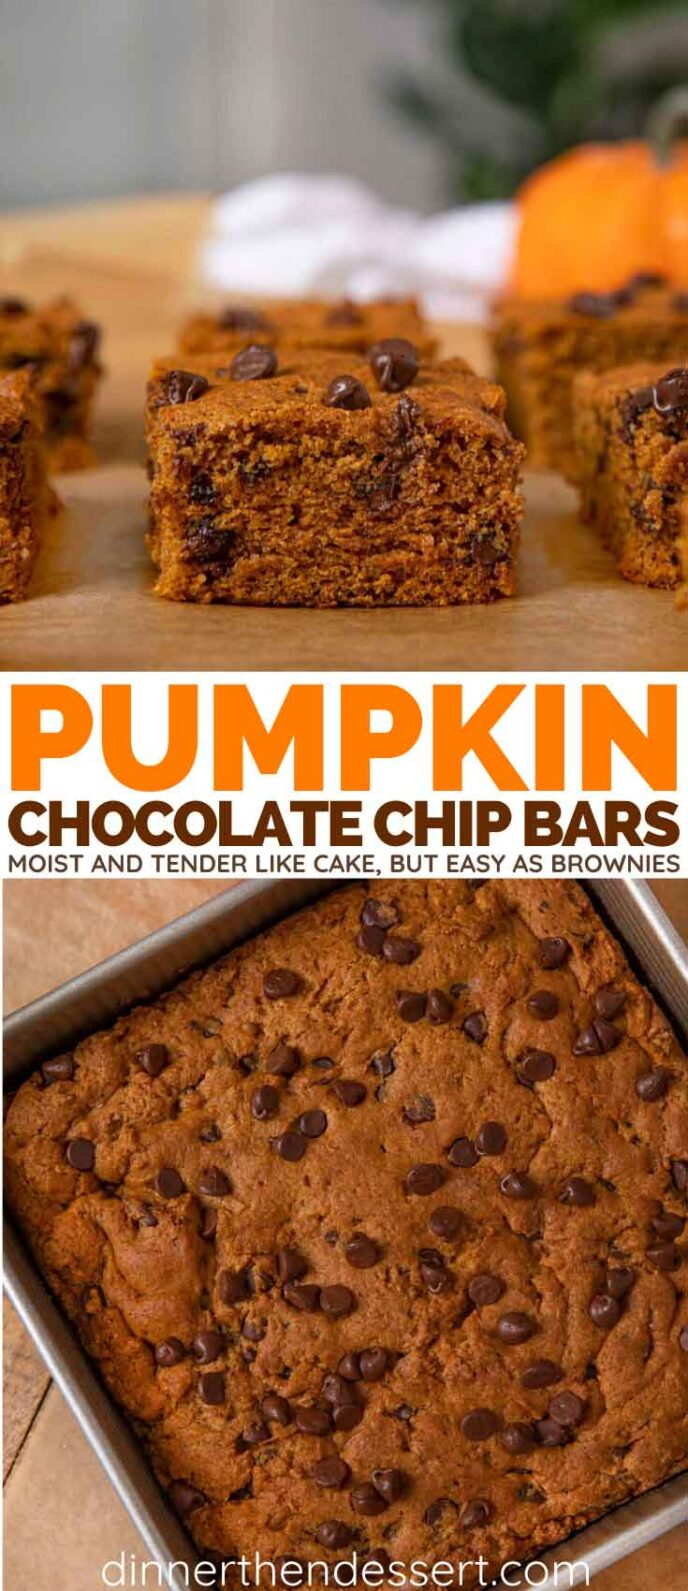 Chocolate Chip Pumpkin Bars collage